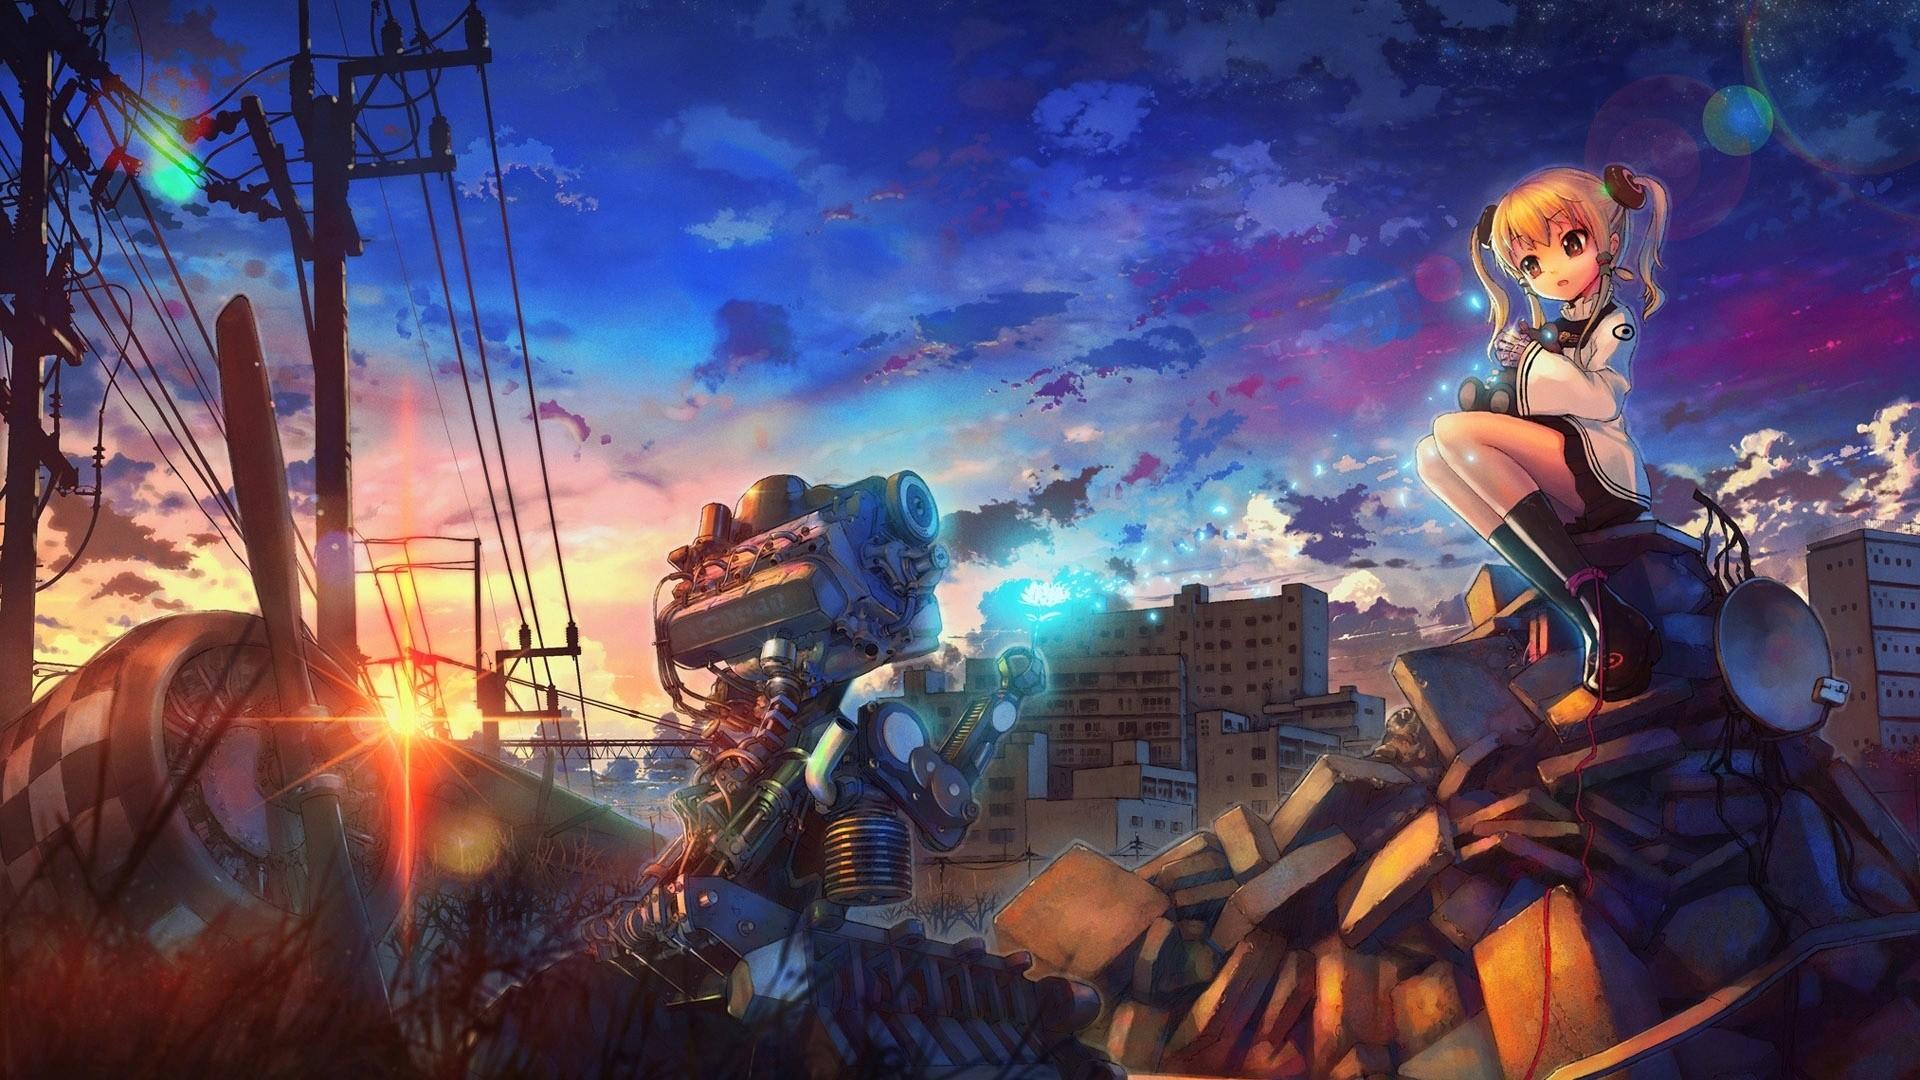 Anime 1920x1080 anime artwork anime girls city destruction engine power lines sunset utility pole sky